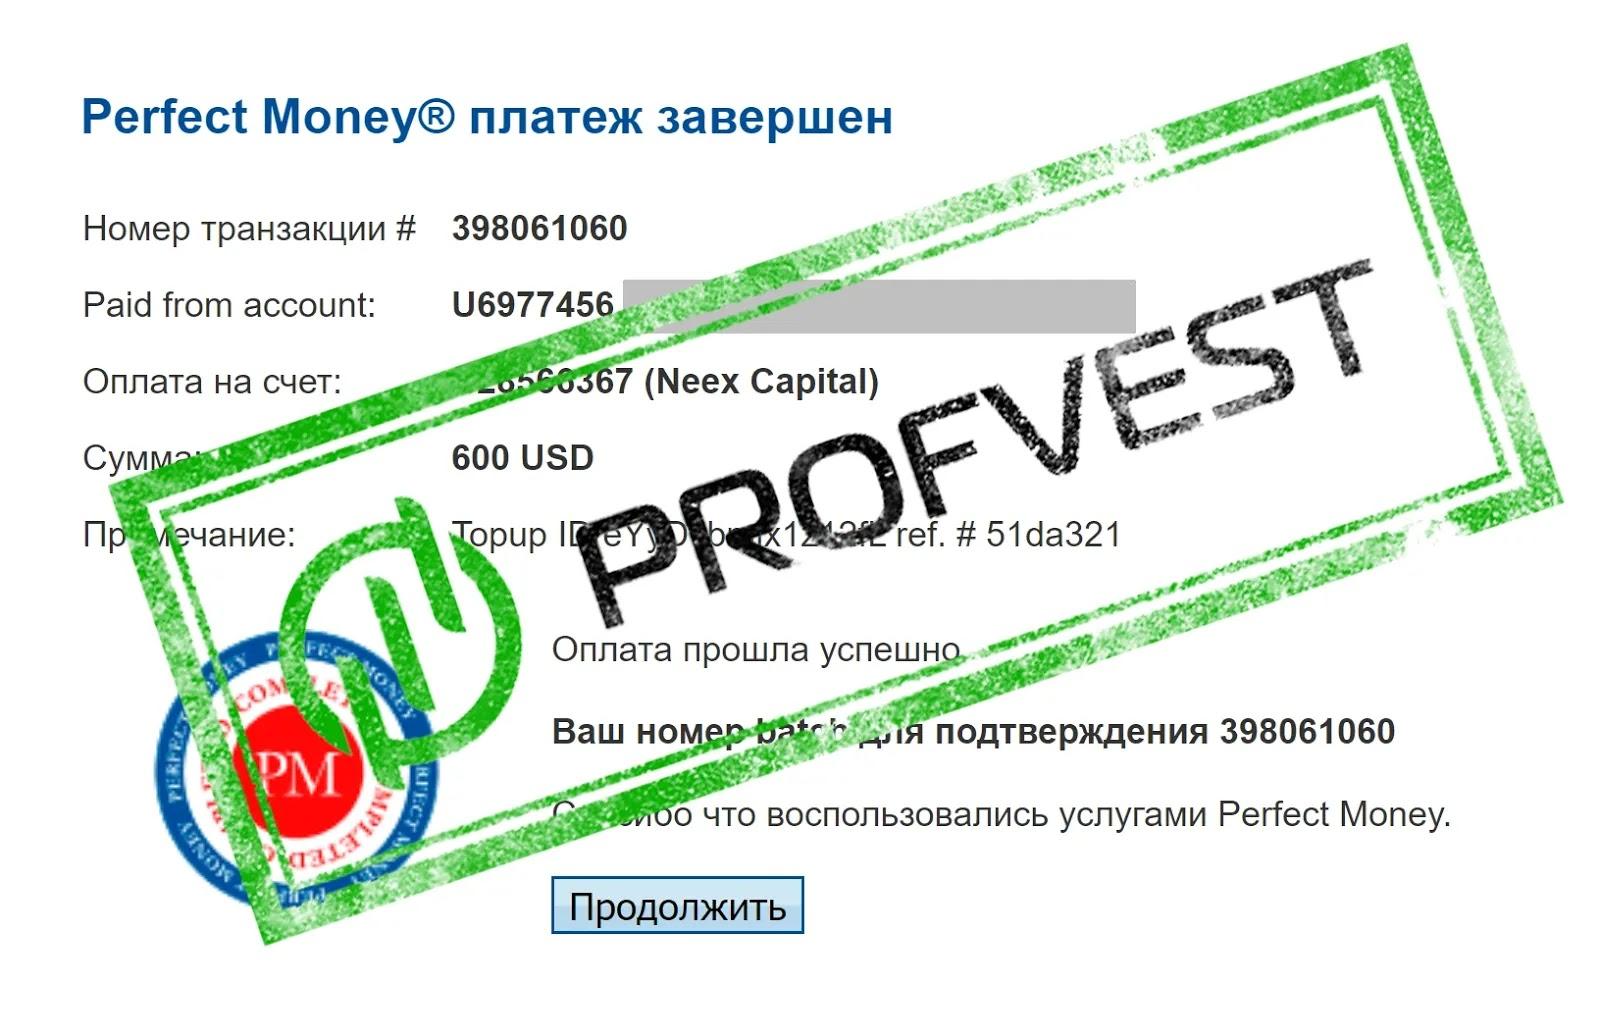 Депозит в Neex Capital